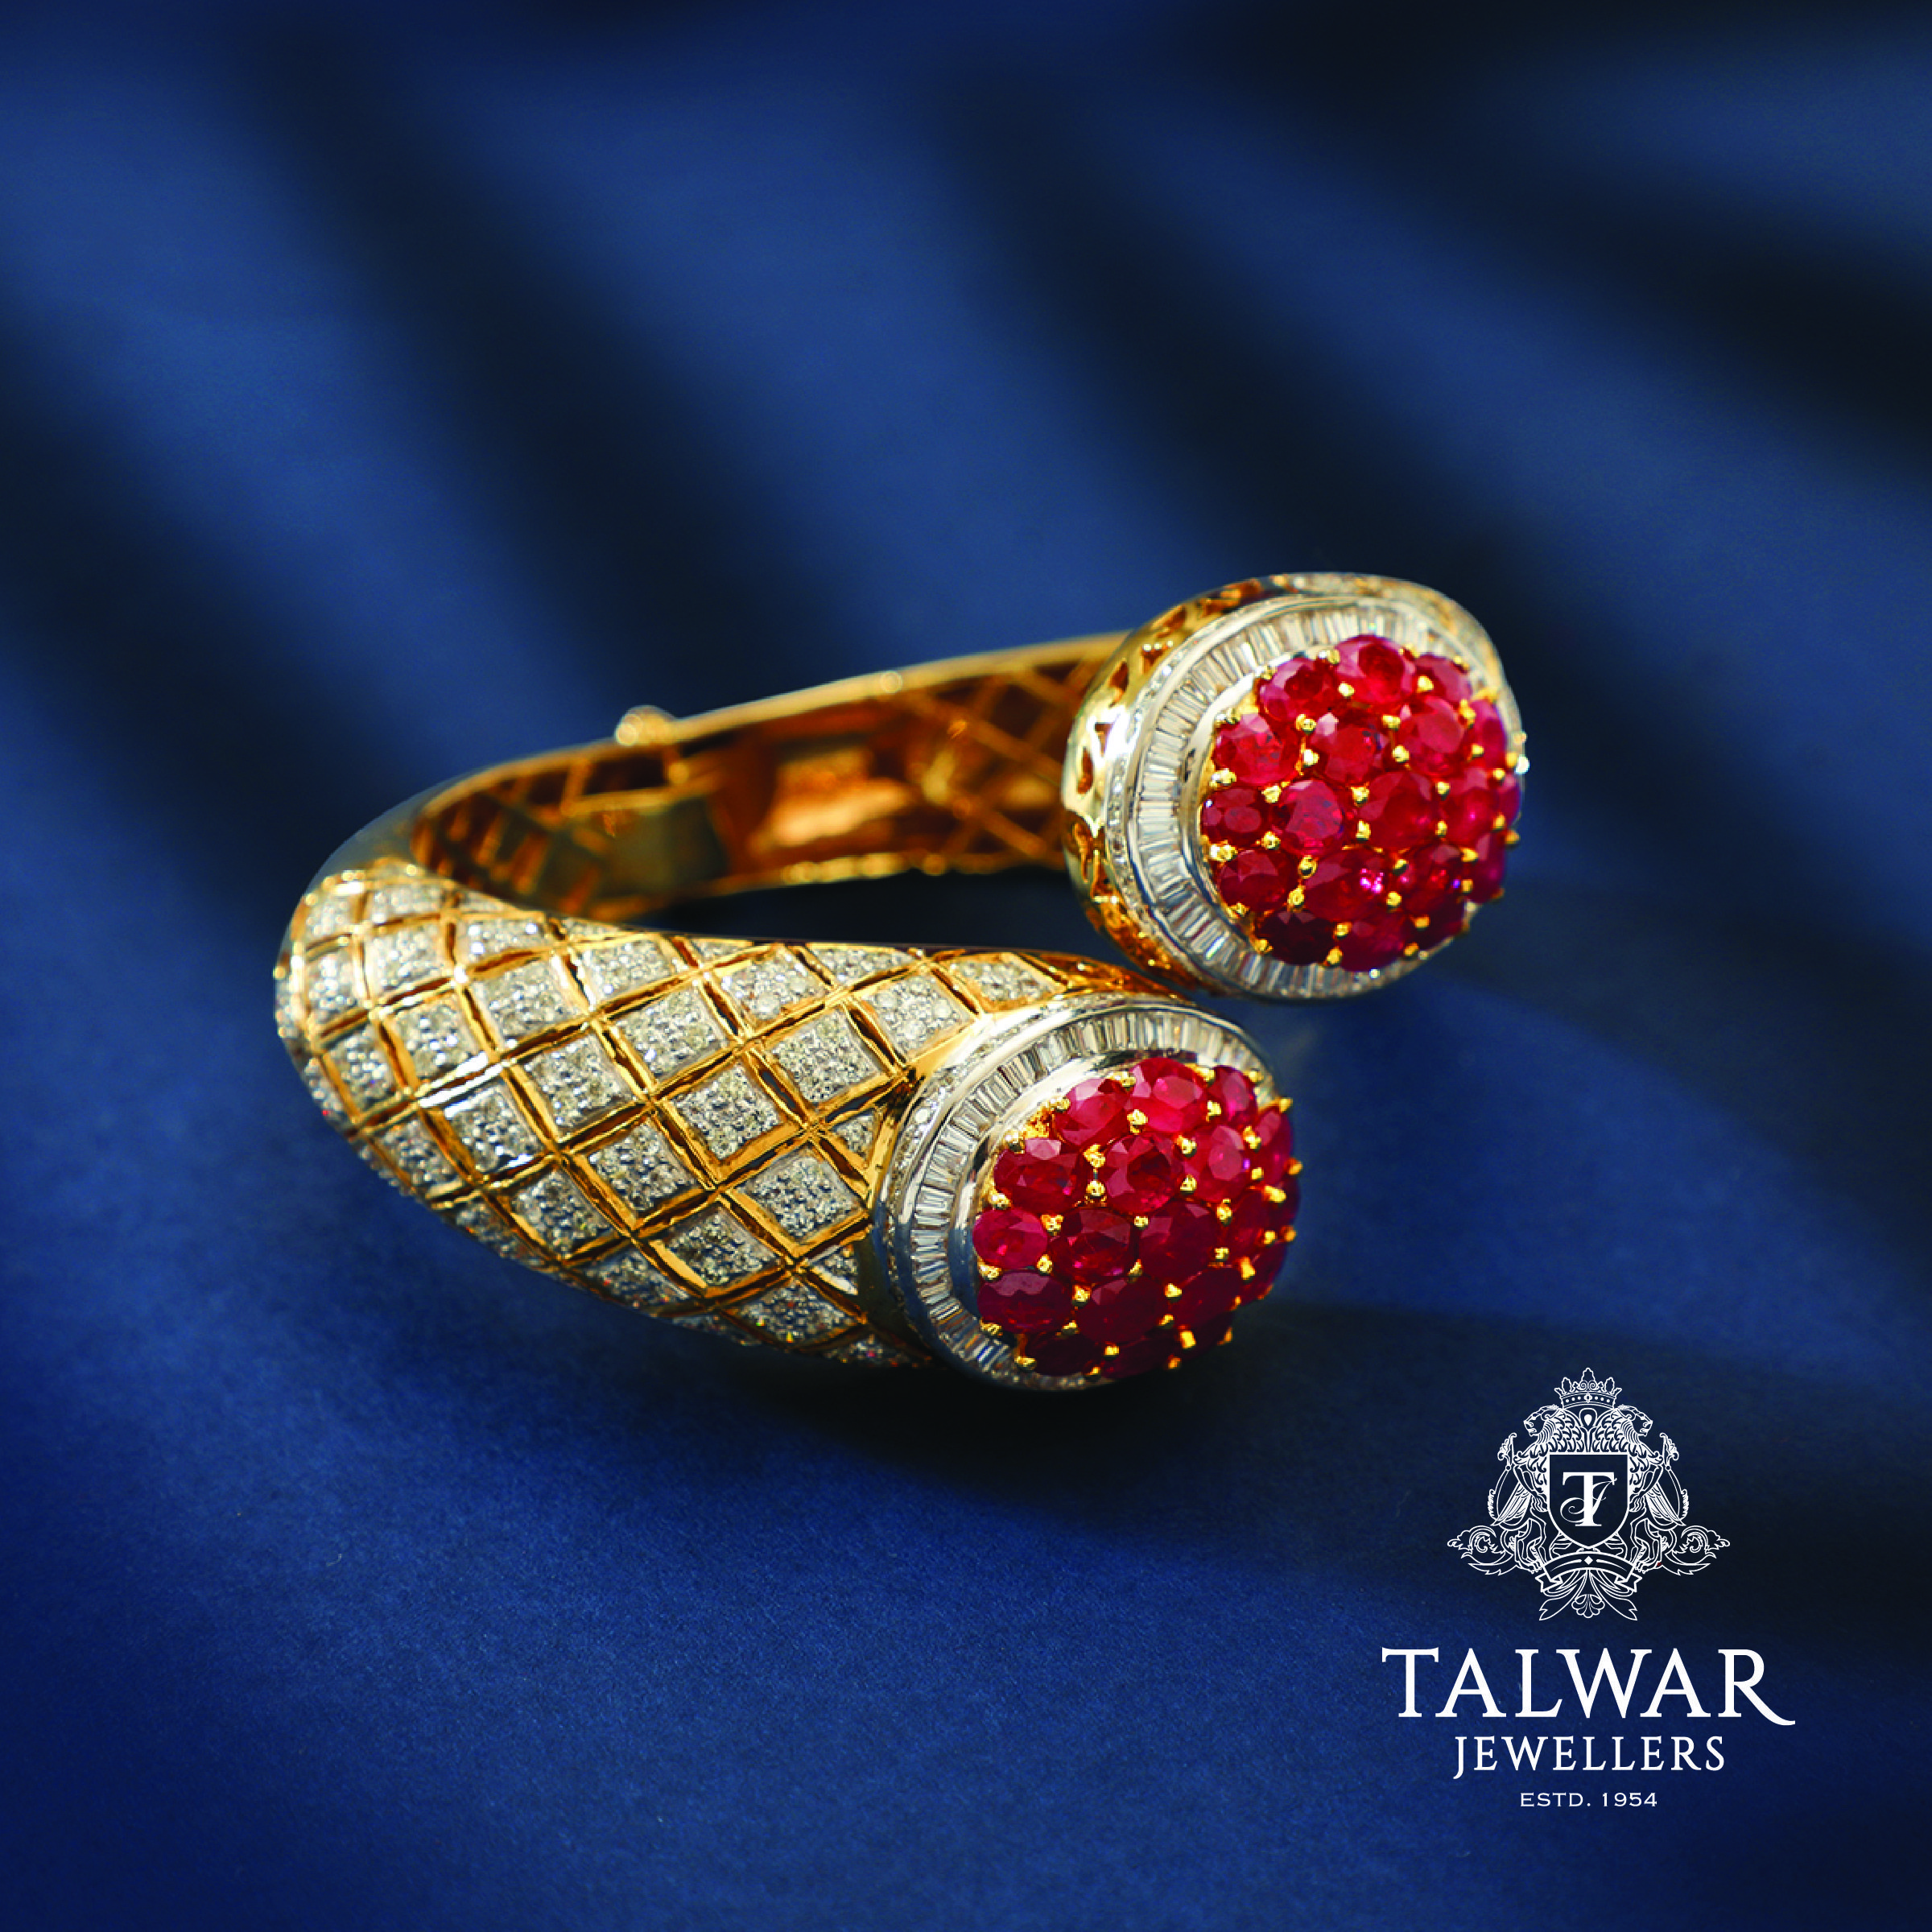 Beautiful Bangle set in Diamonds Gold and Rubies Talwar